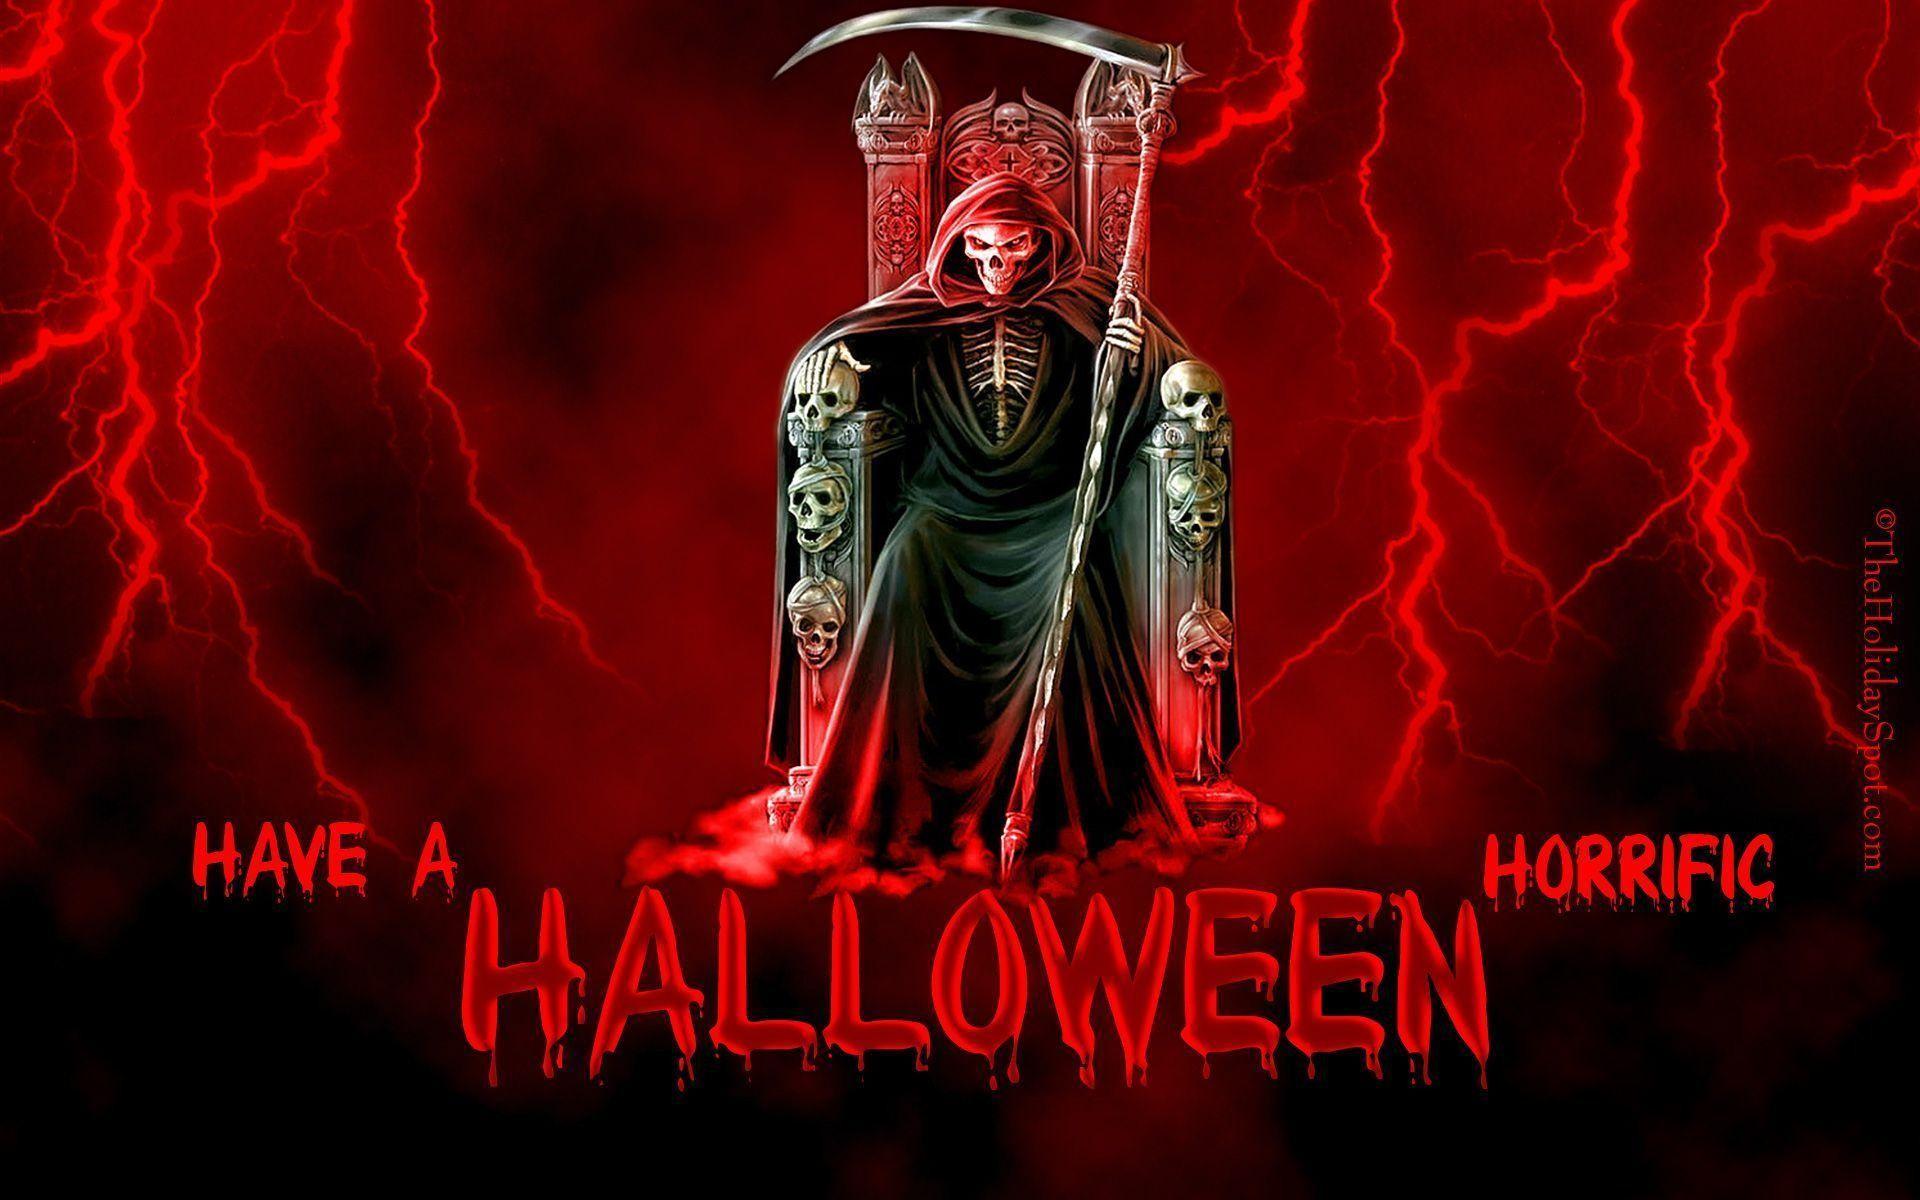 2560x1600 Halloween Wallpaper HD Free